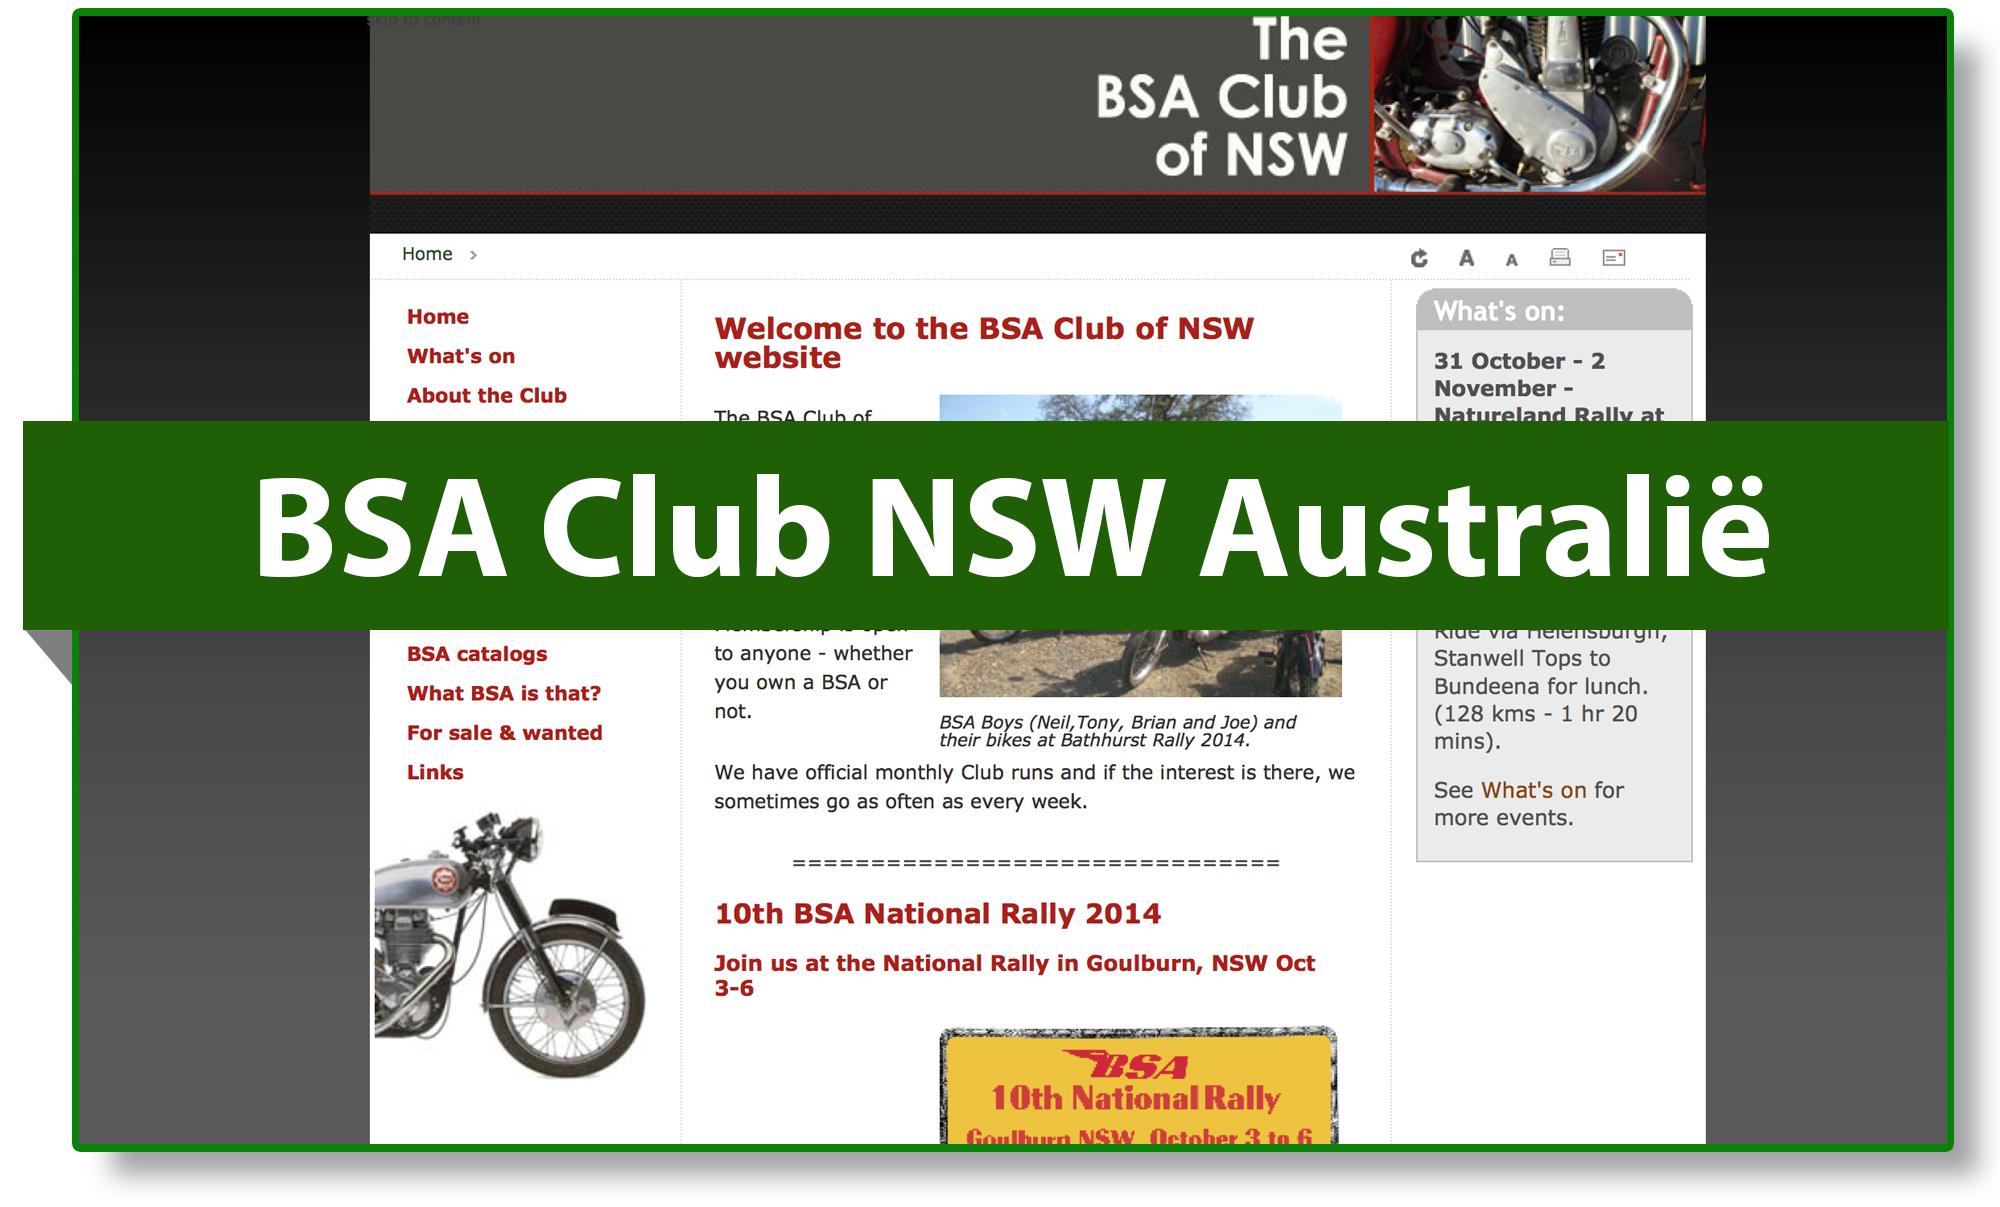 BSA club NSW Australië